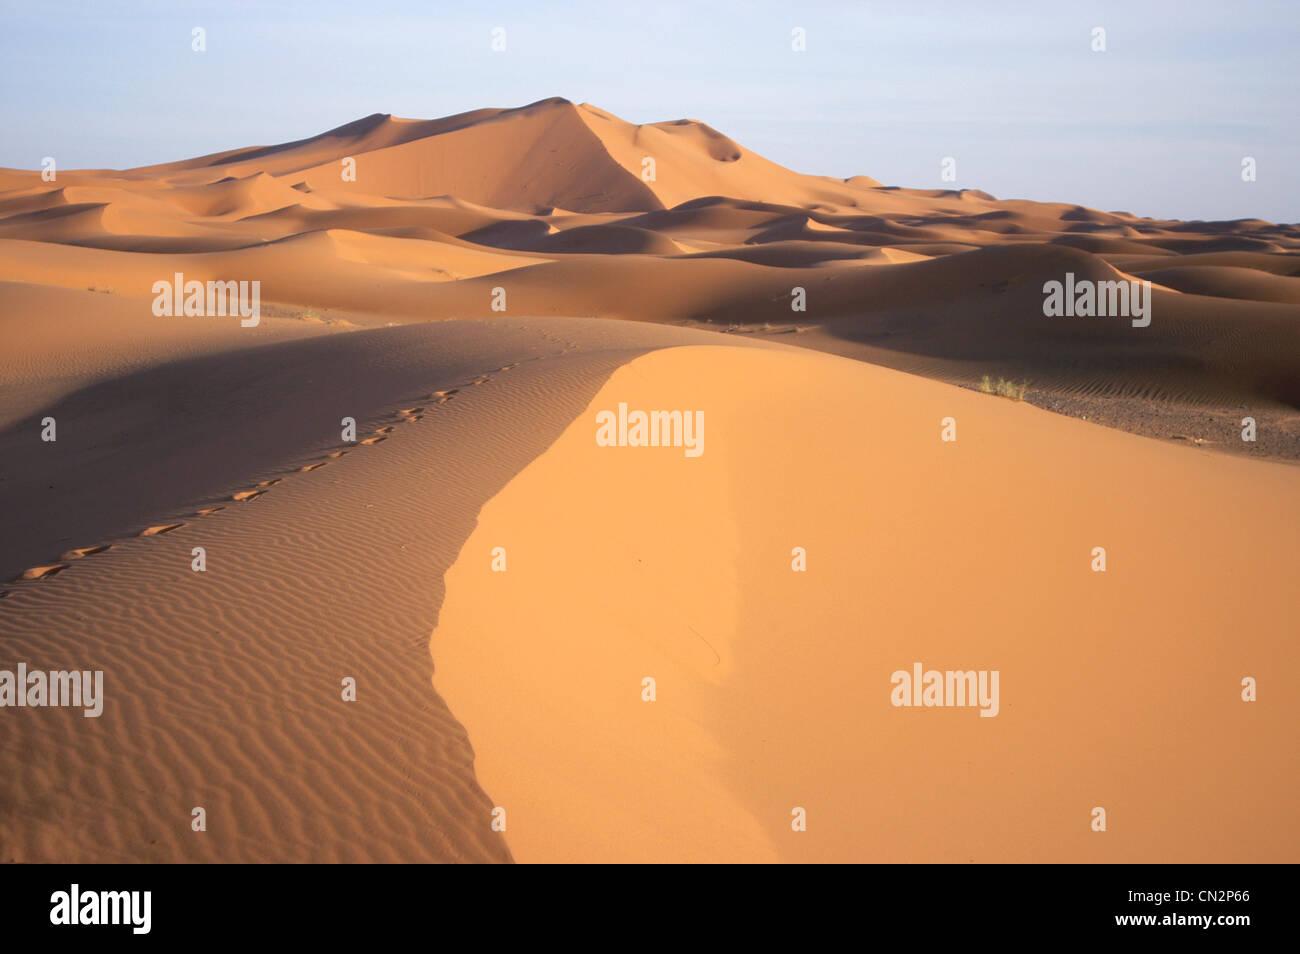 Fußabdrücke in der Wüste, Marokko, Nordafrika Stockbild